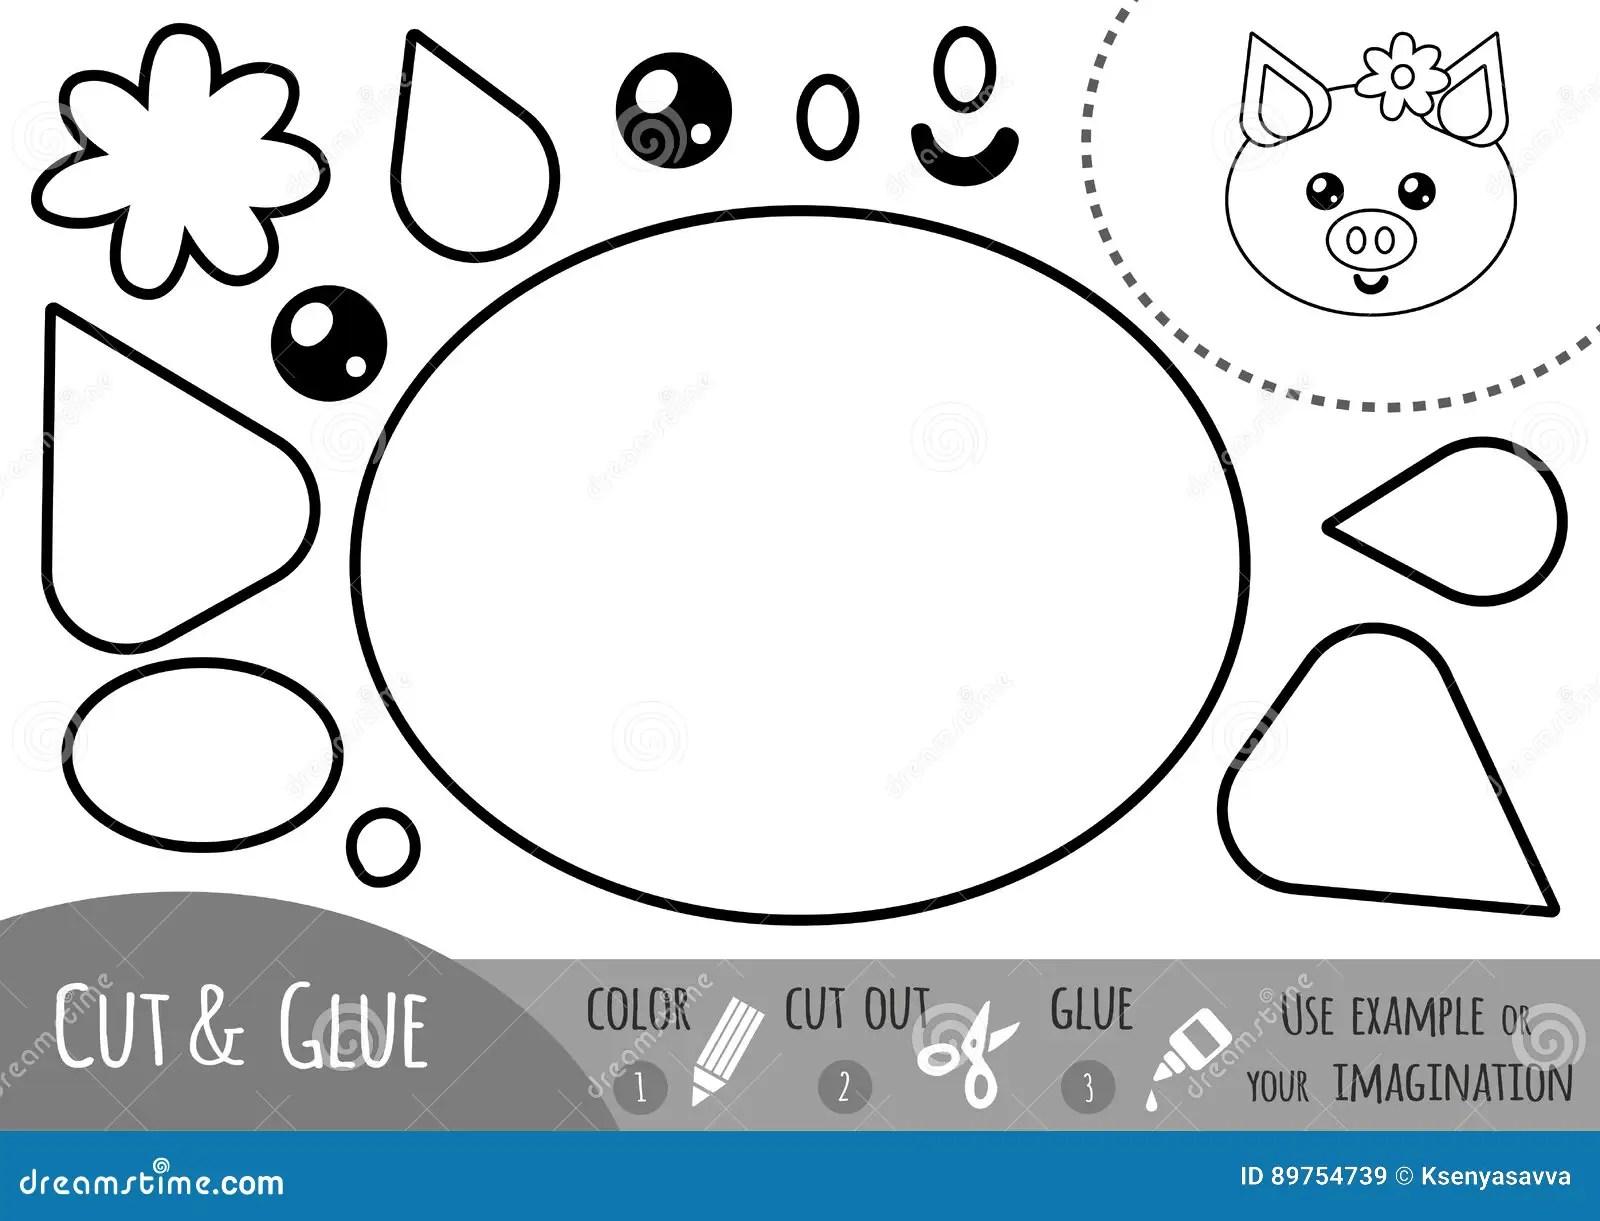 Education Paper Game For Children Pig Stock Vector